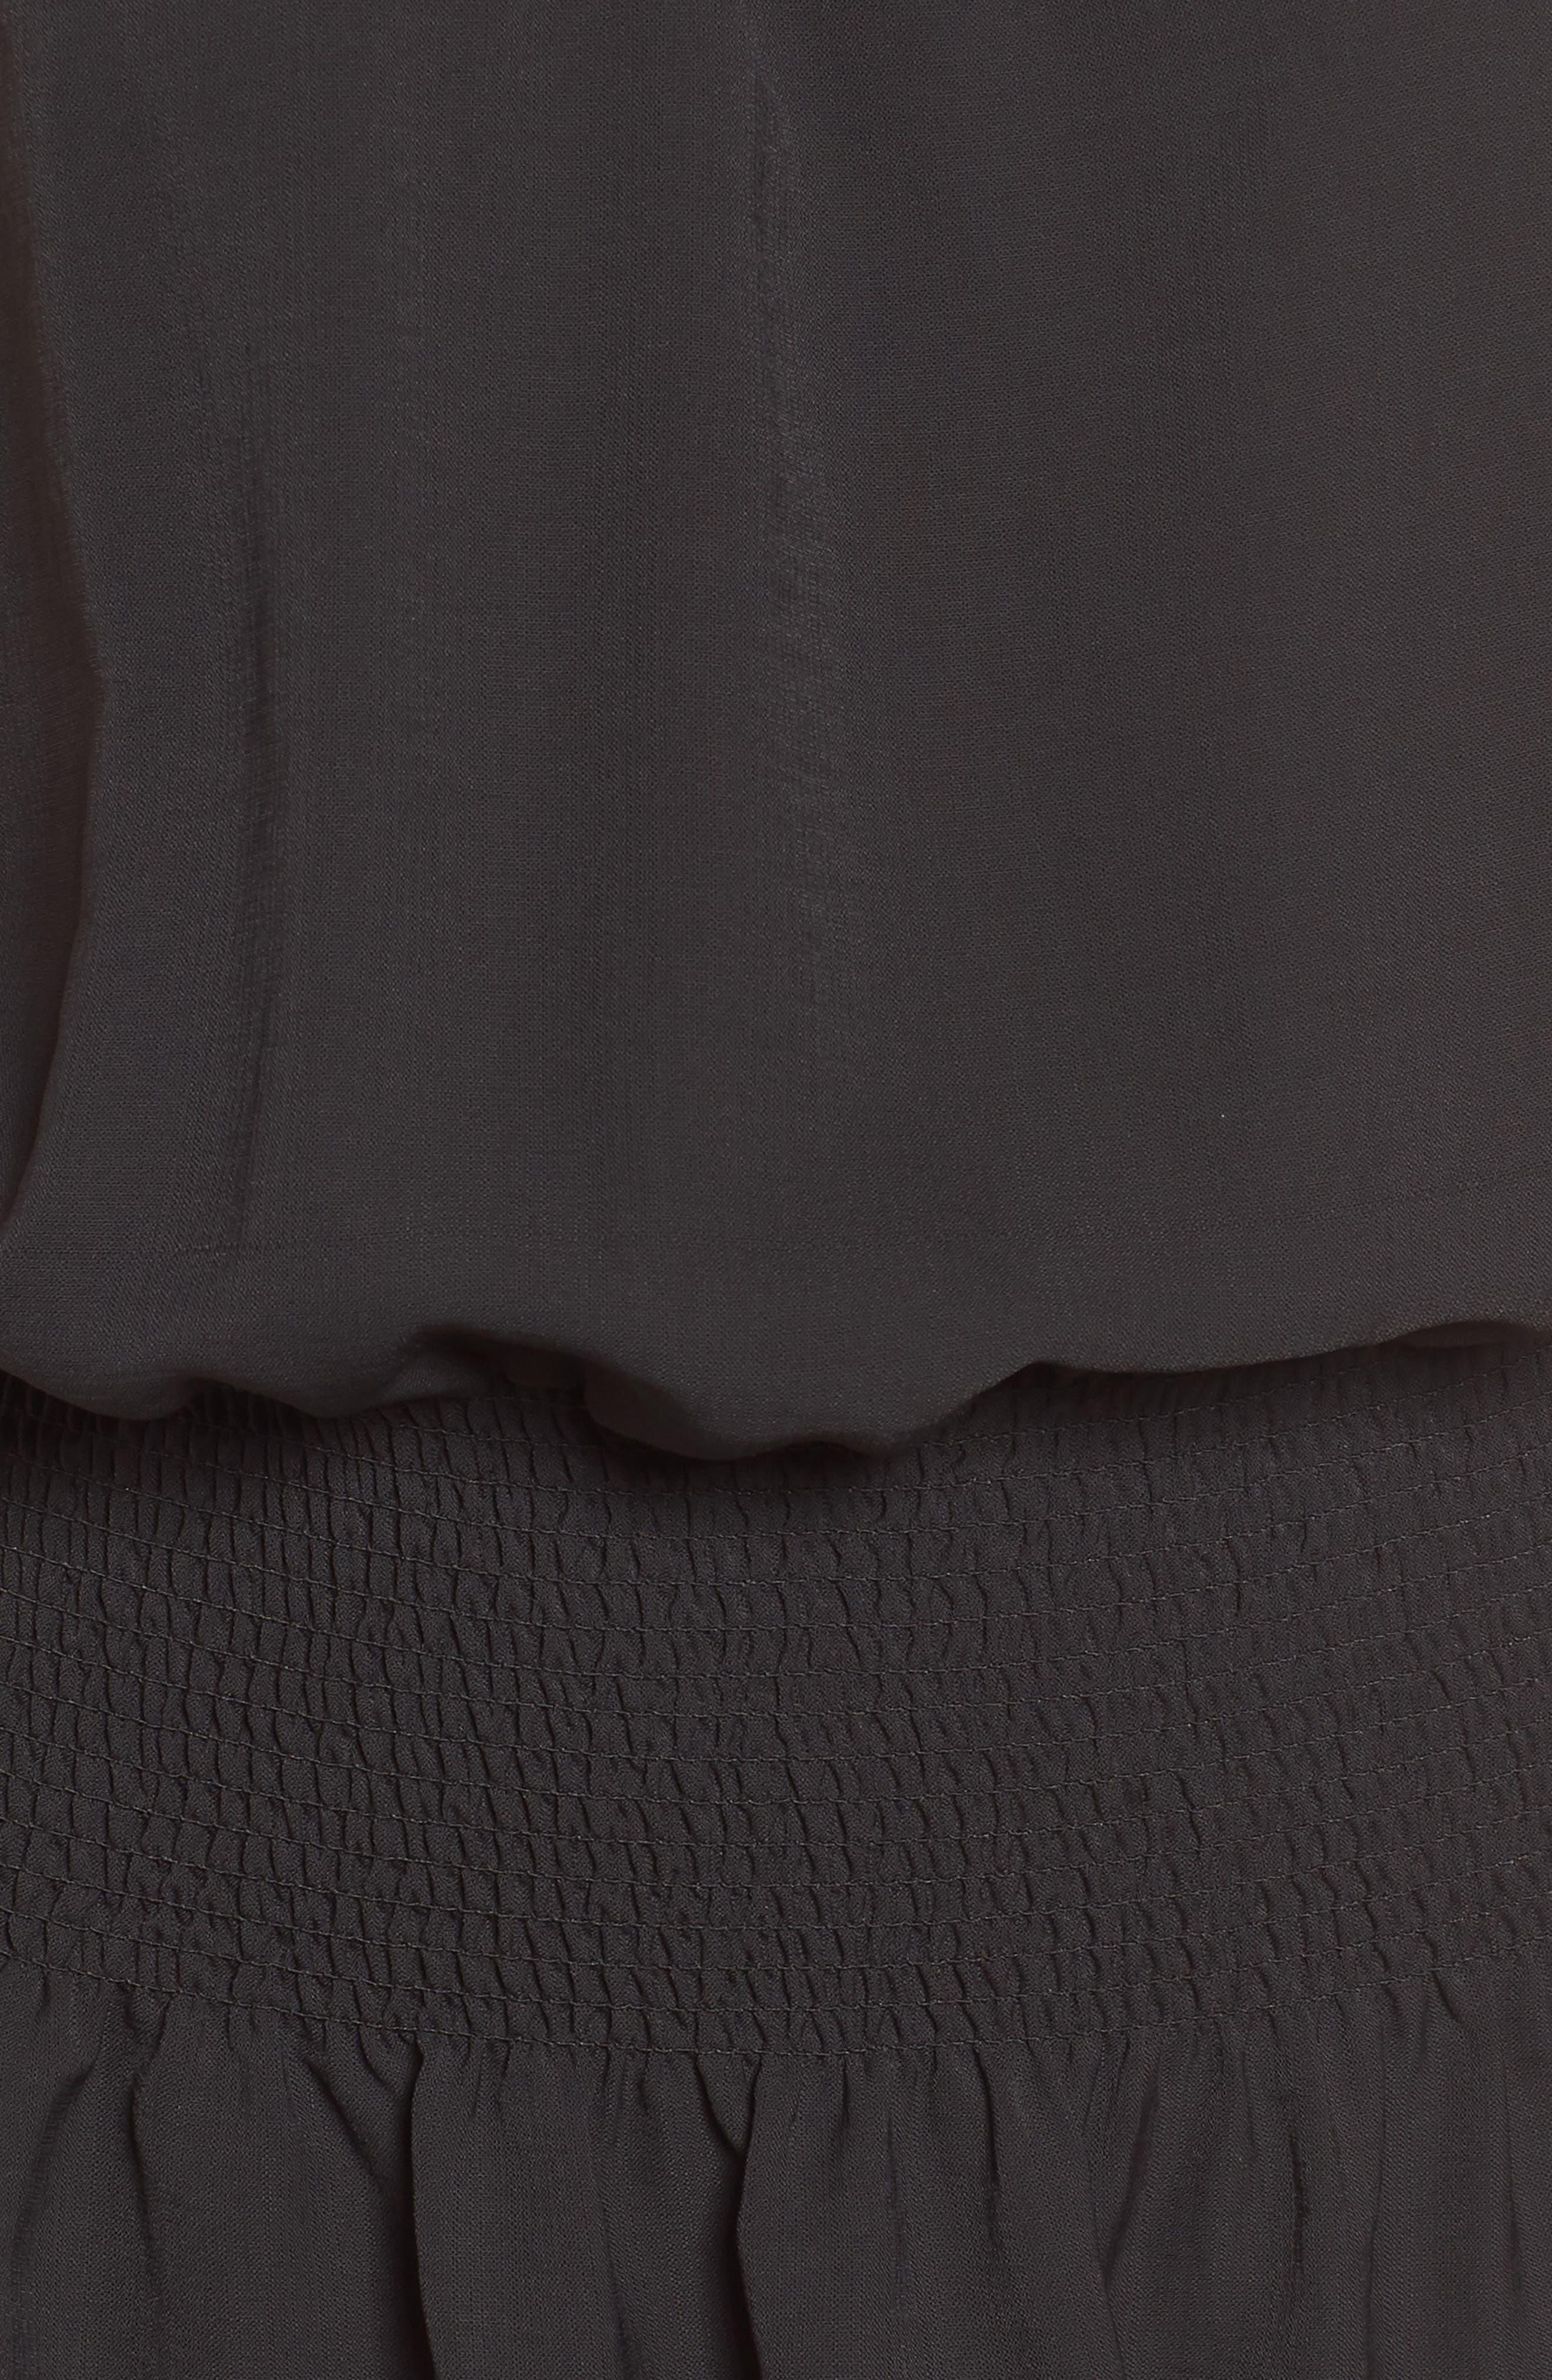 Bishop + Young Smocked Dress,                             Alternate thumbnail 6, color,                             Black